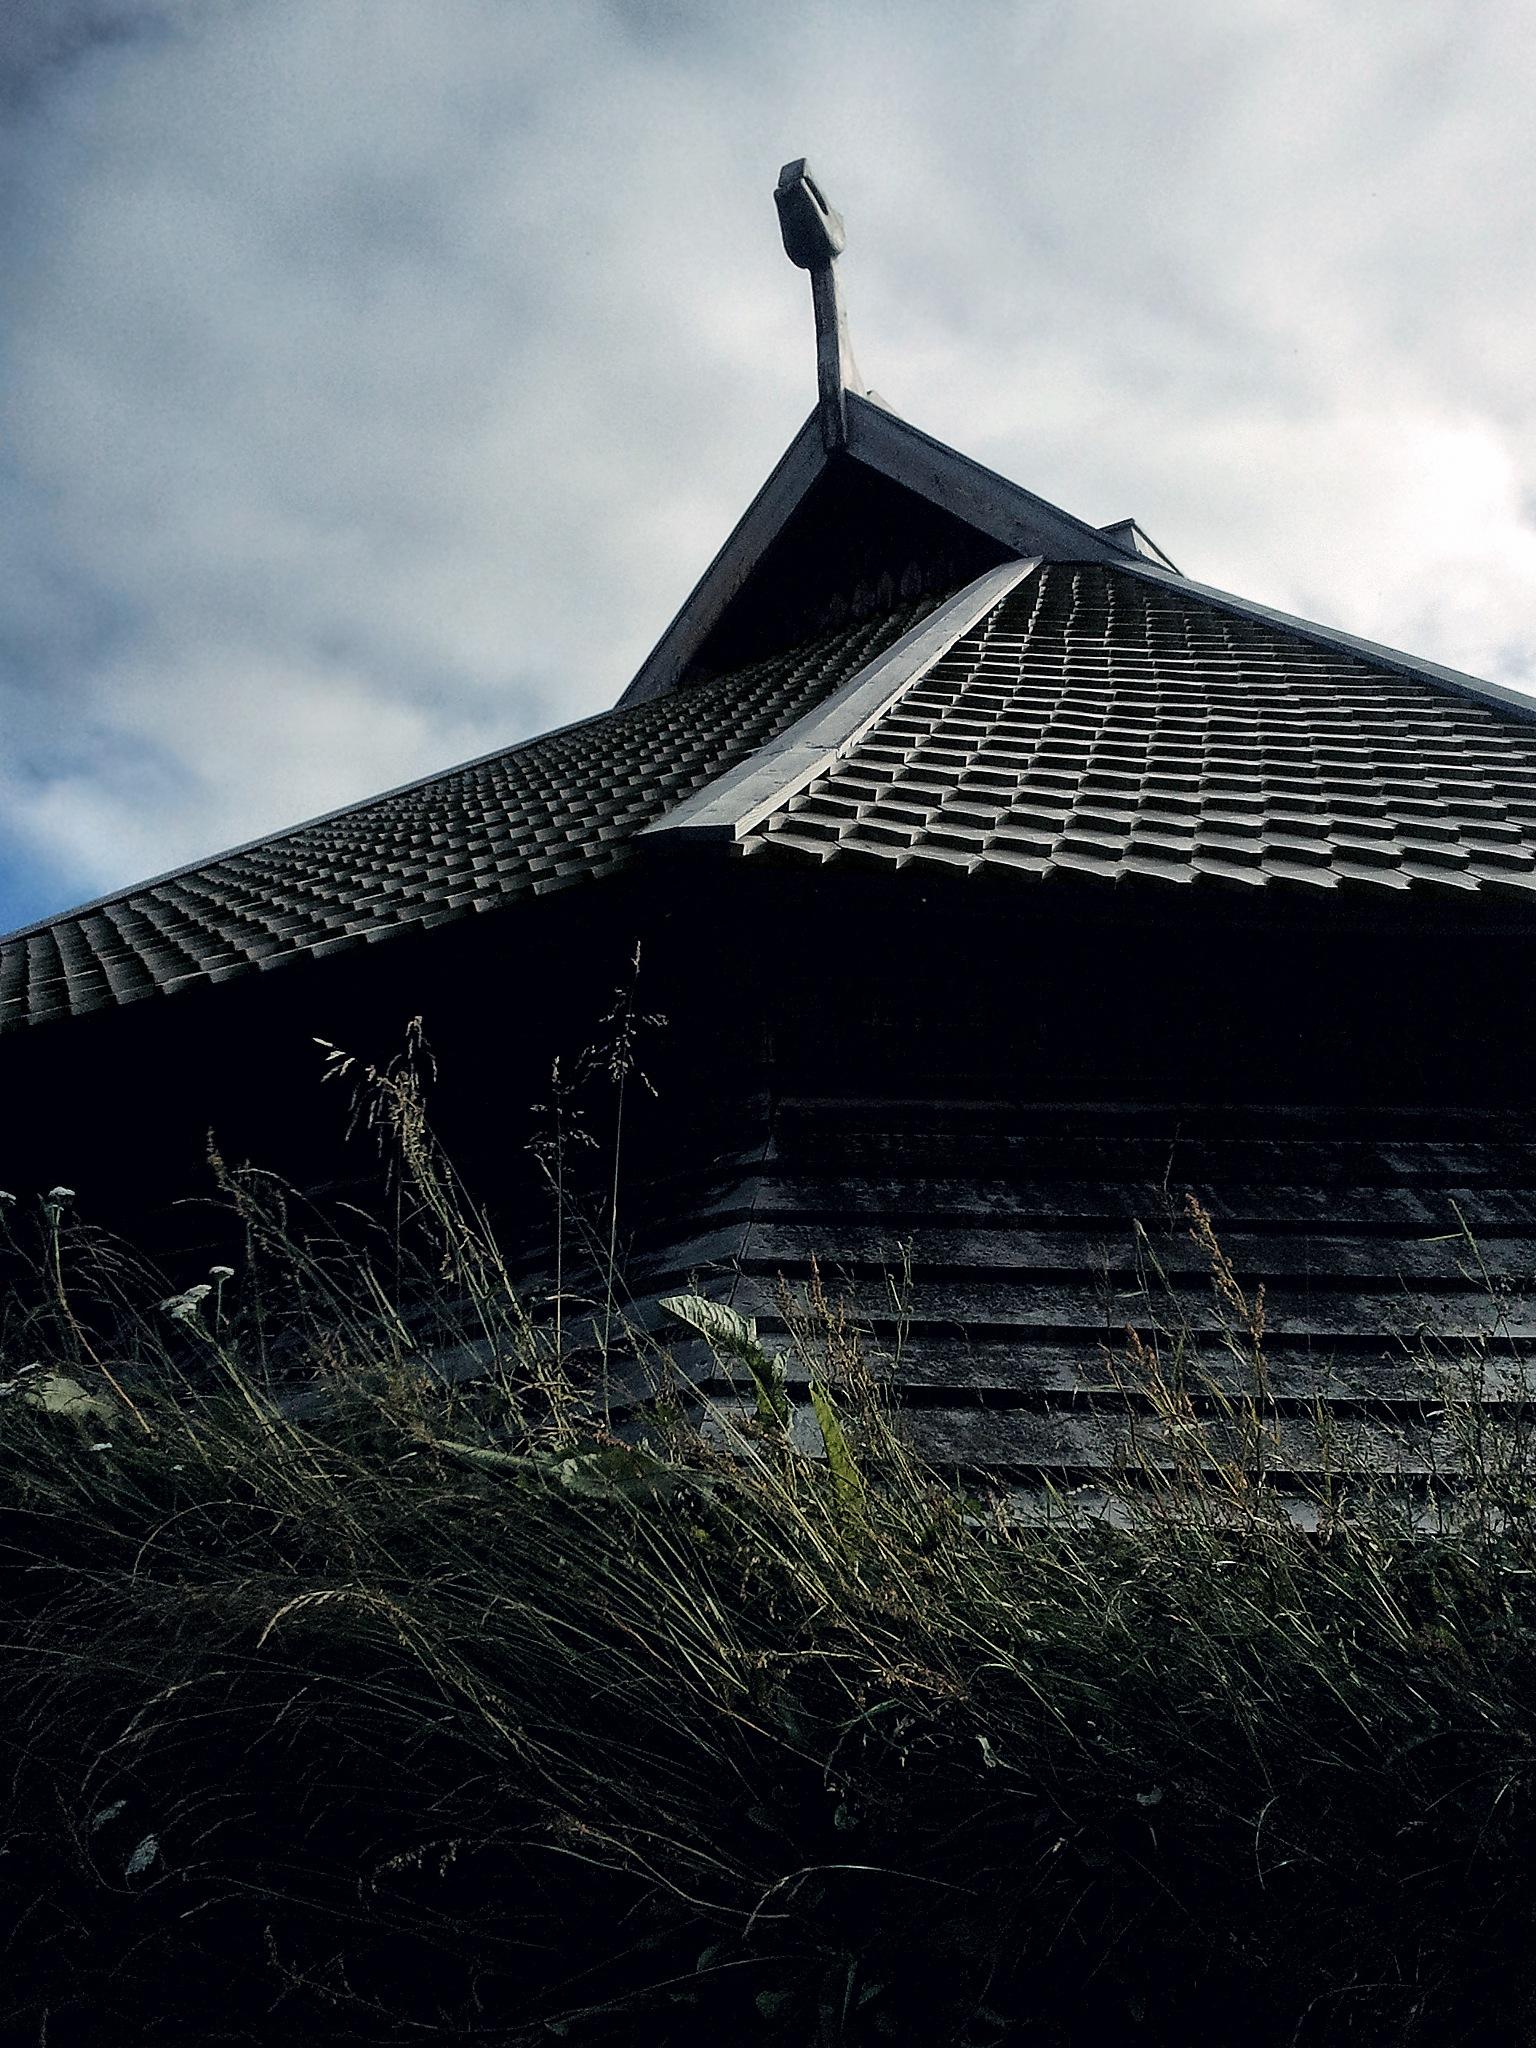 Viking House in Borg - Lofoten - Norway by Freddy Arntsen